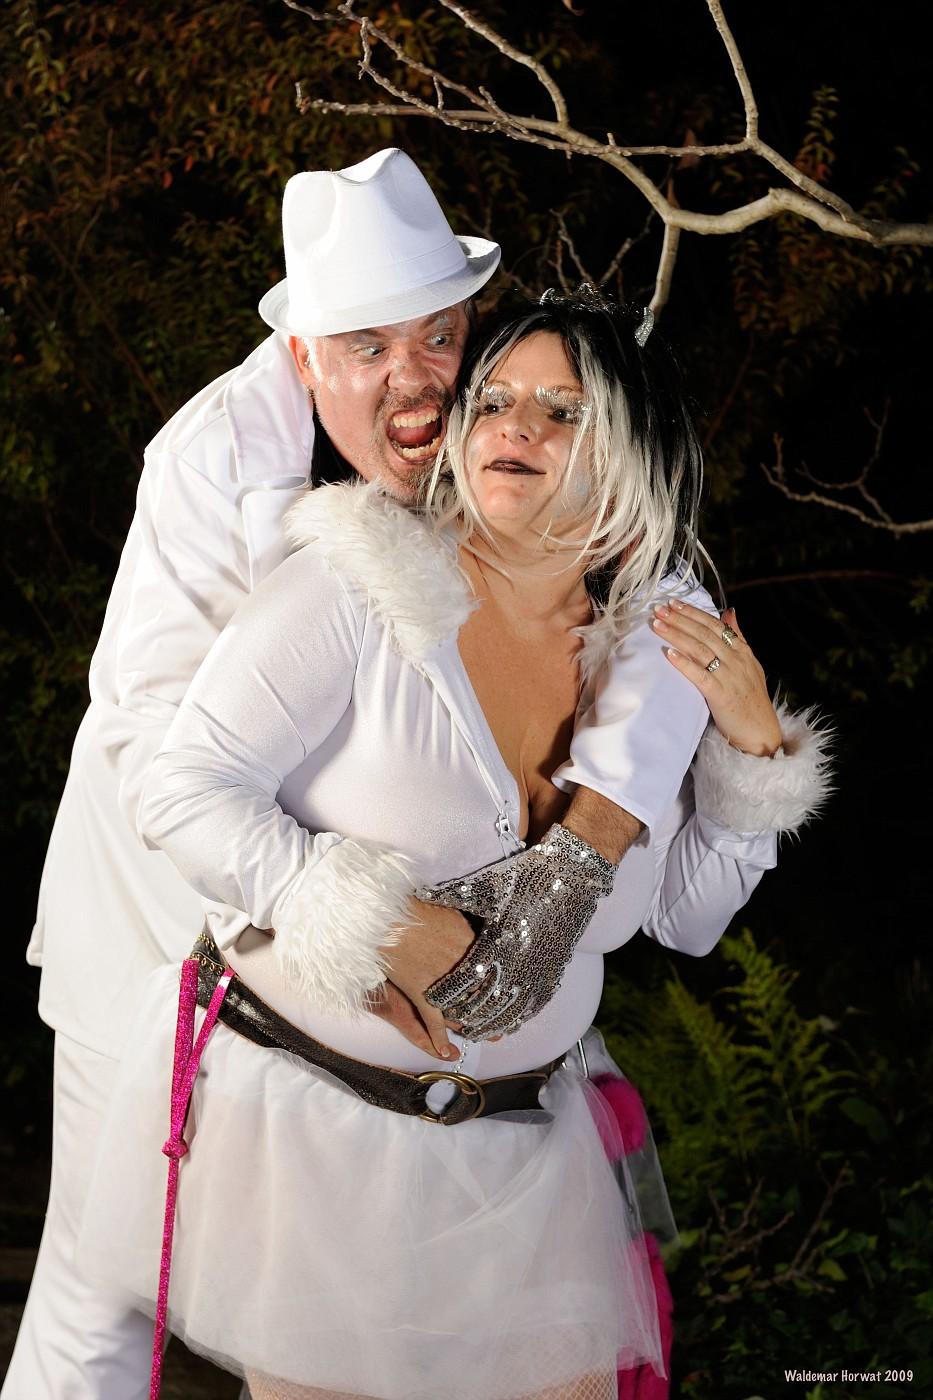 Craig and Melinda